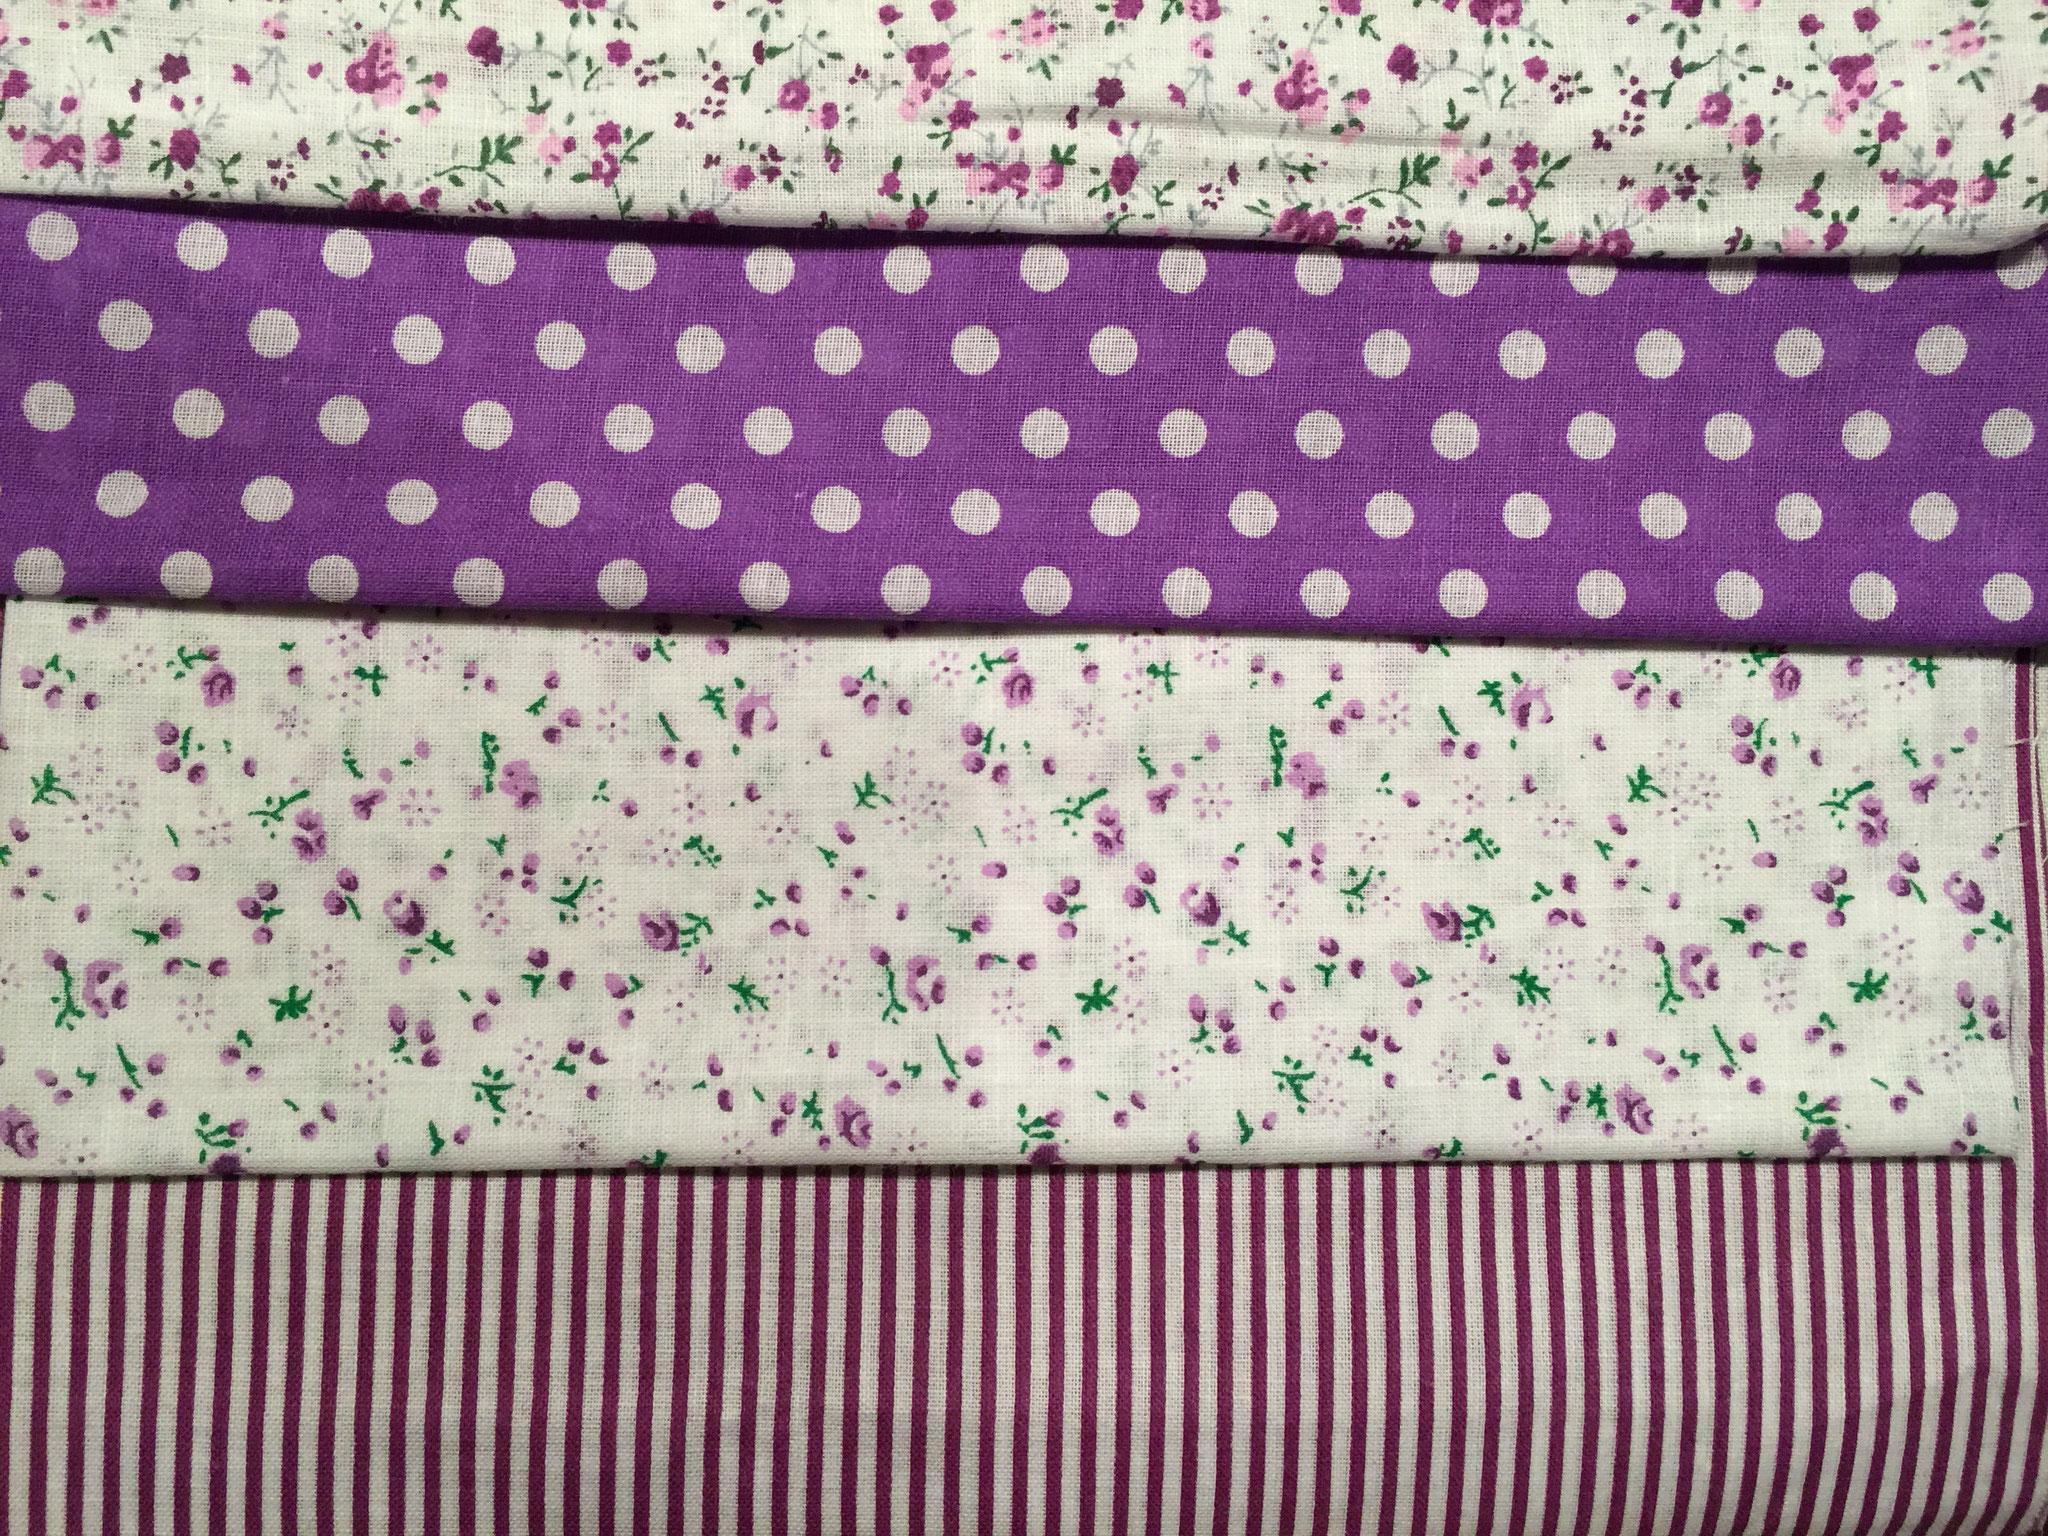 7 Stoffe in violett